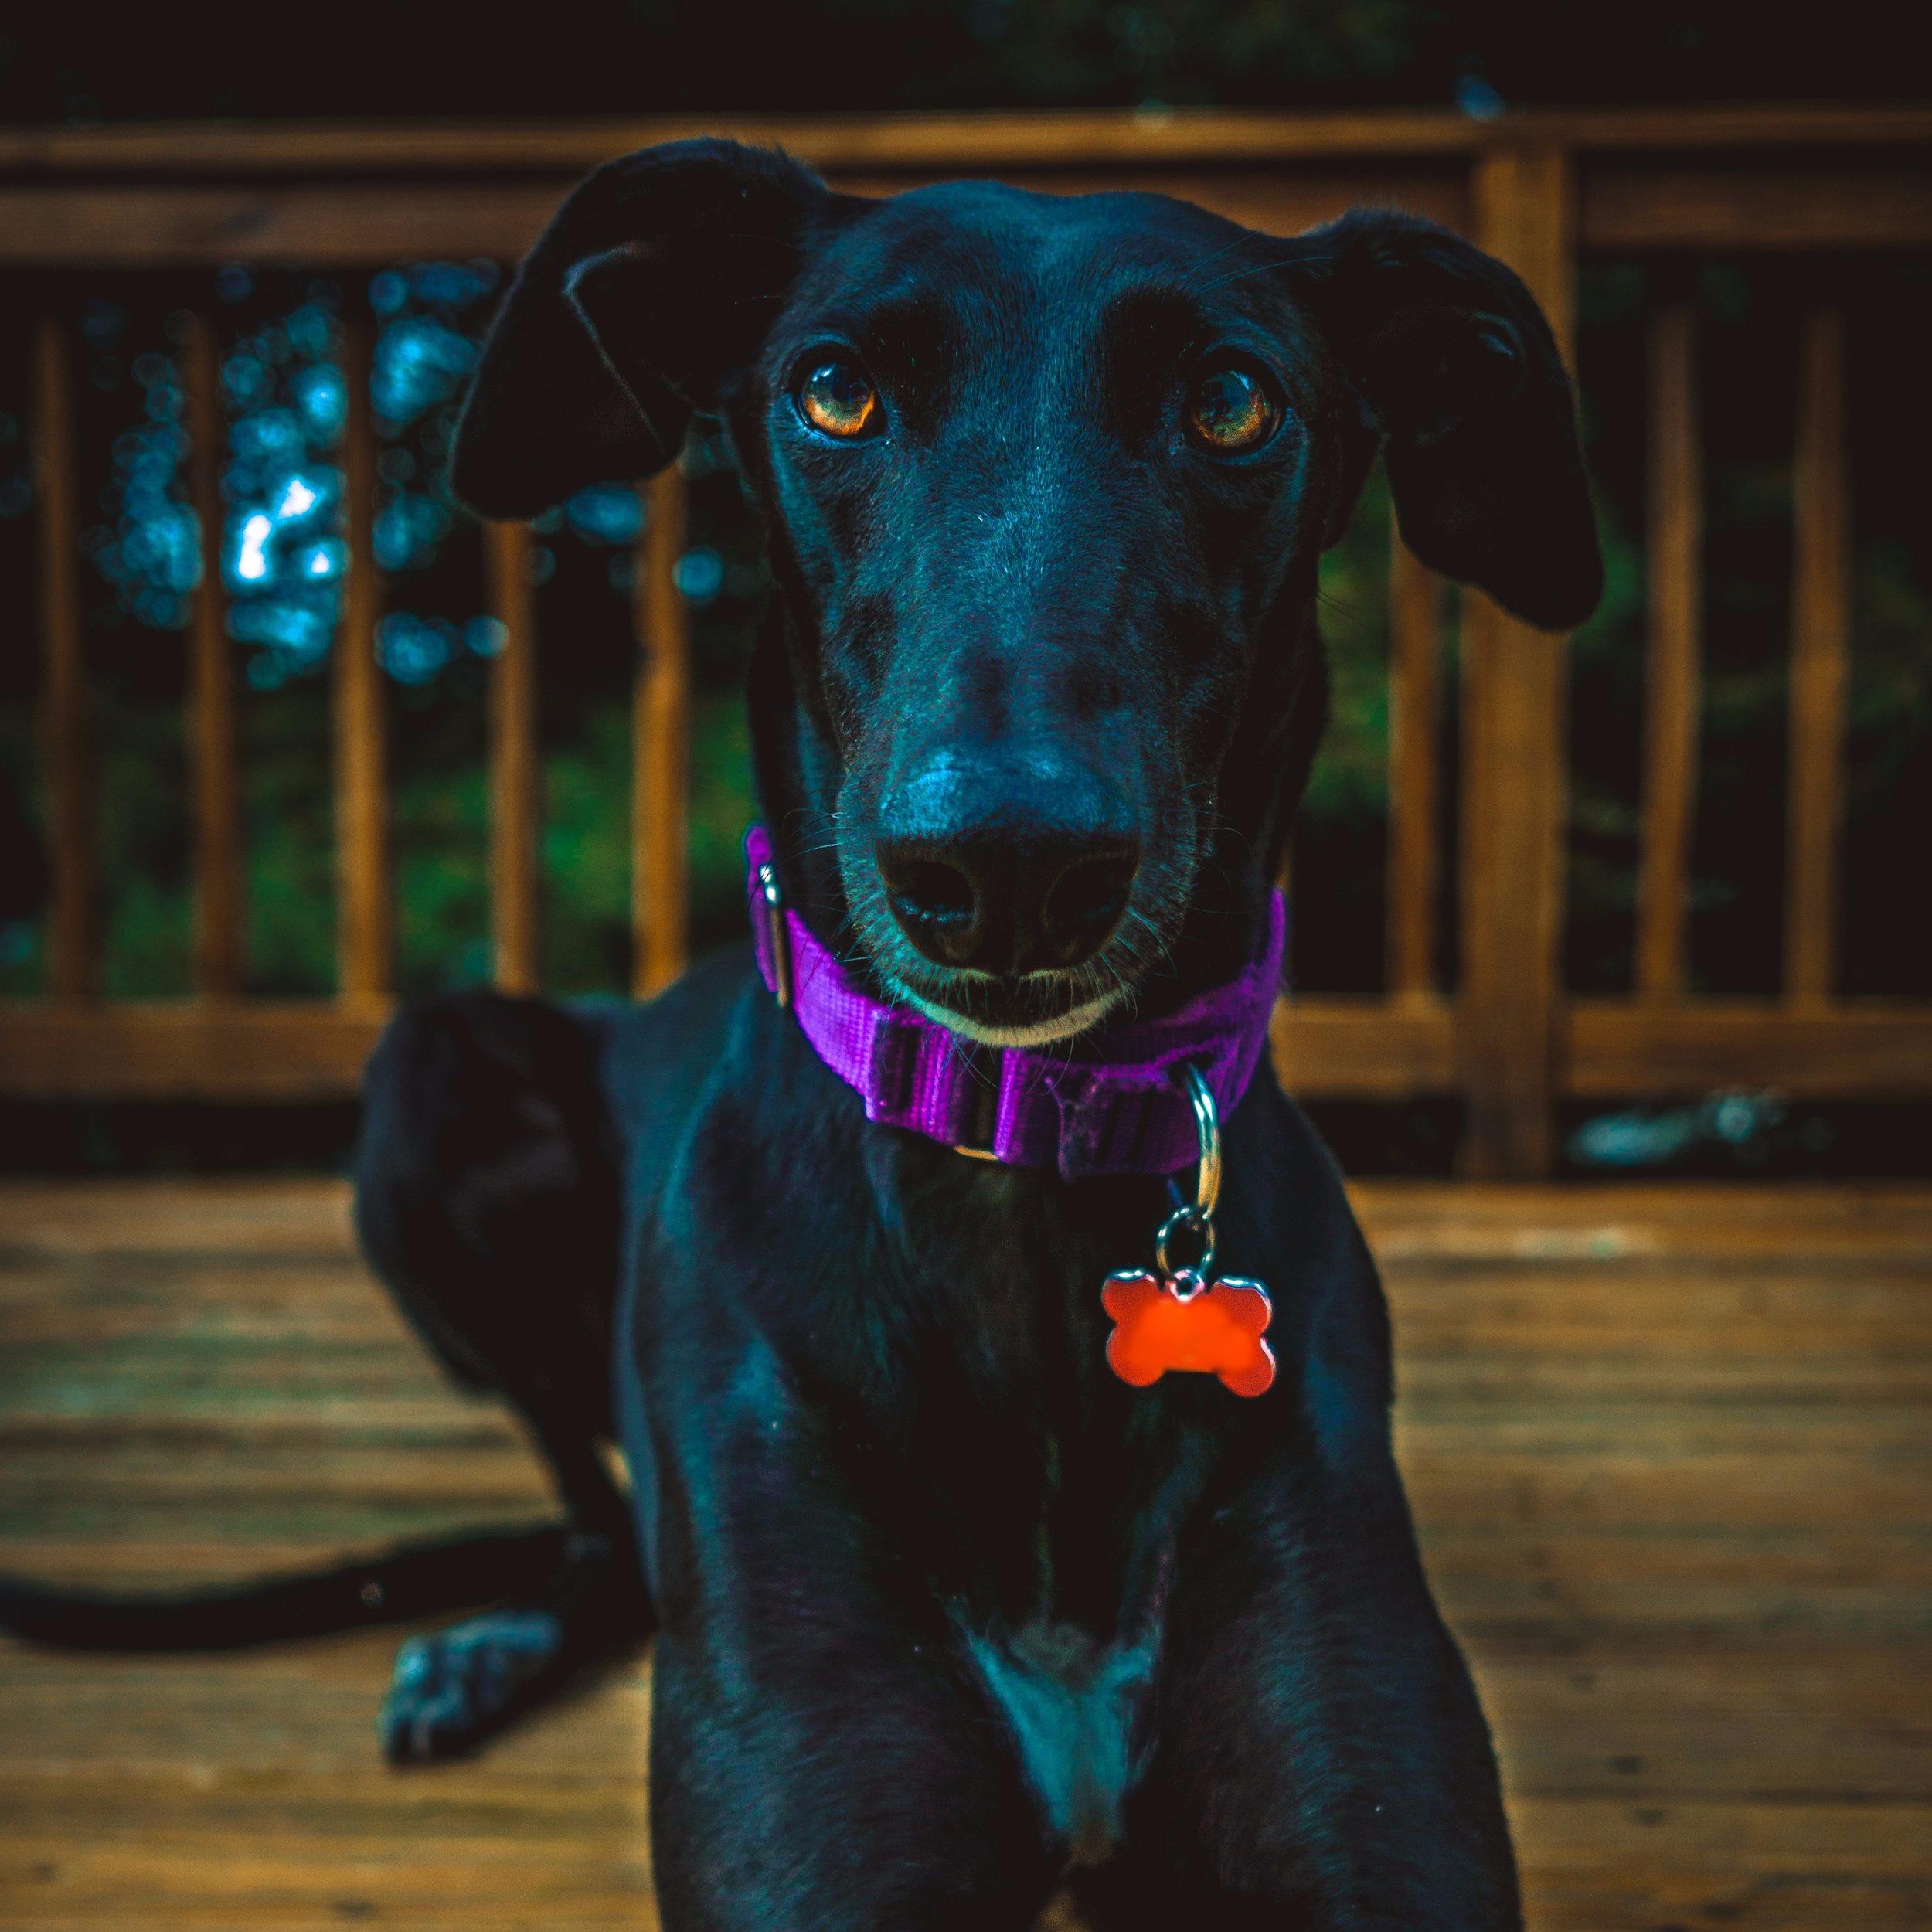 Homeward Bound Animal Care LLC  Lakes Region New Hampshire  Dog Walker  Lost Dog Prevention April 23, 2019